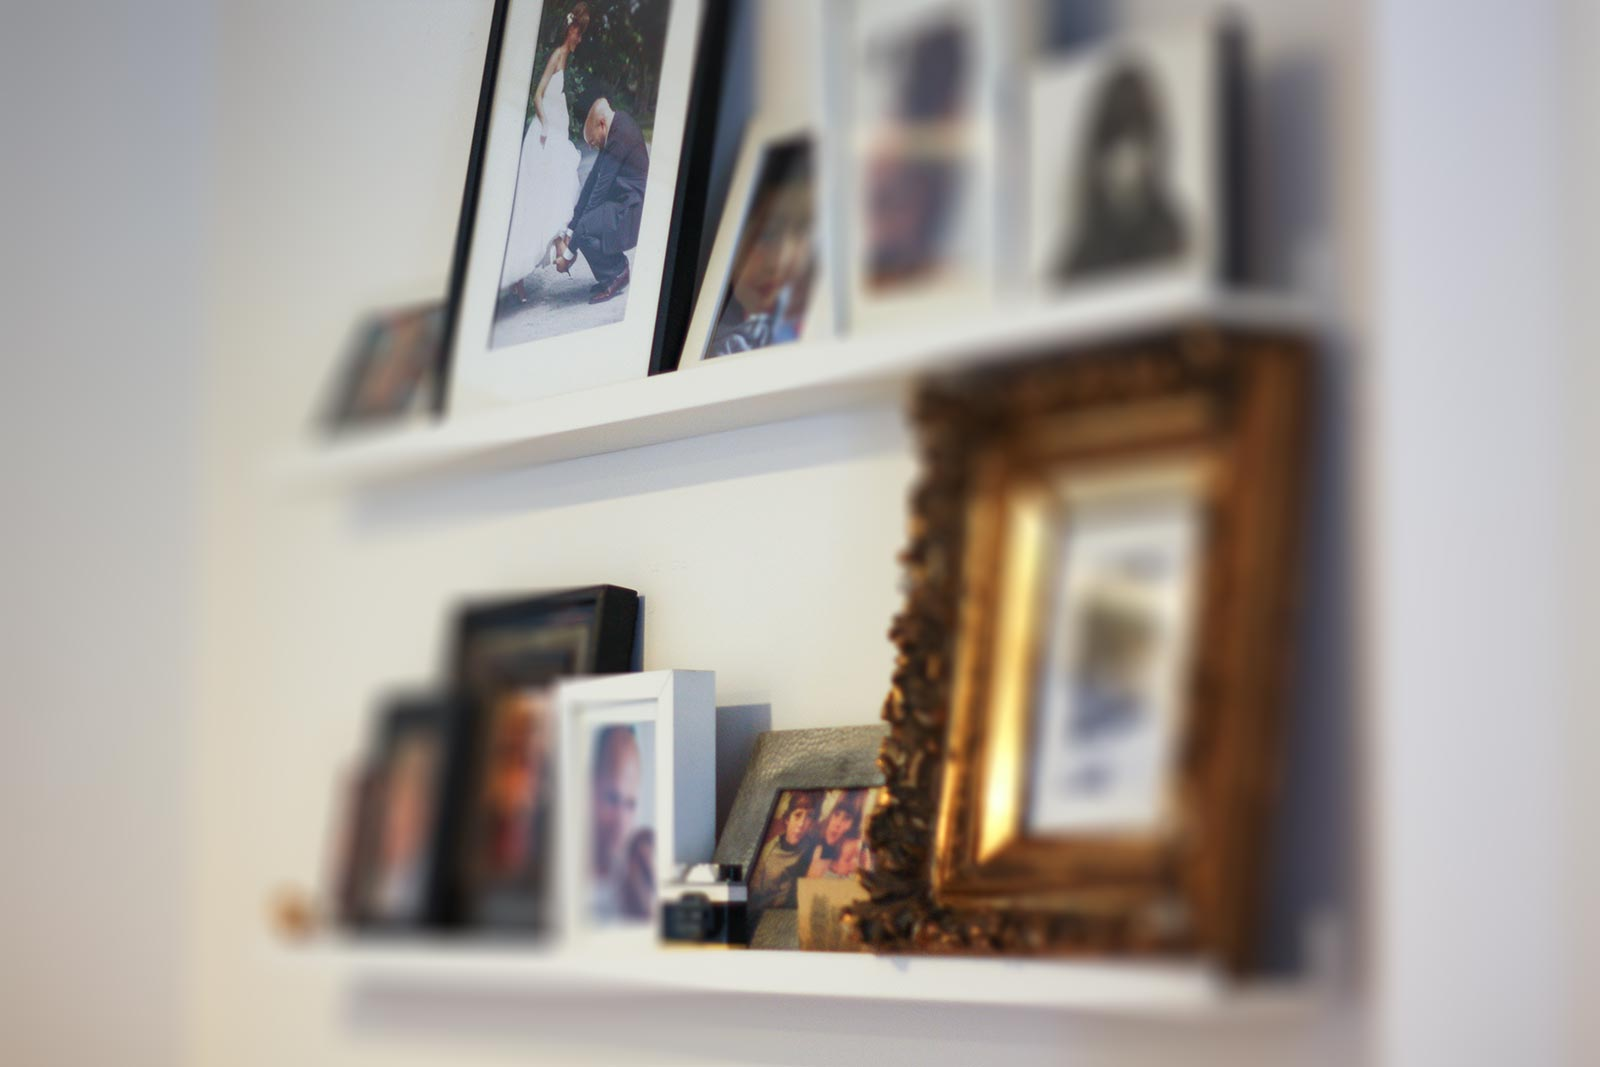 Bildergalerien - Bilderleiste